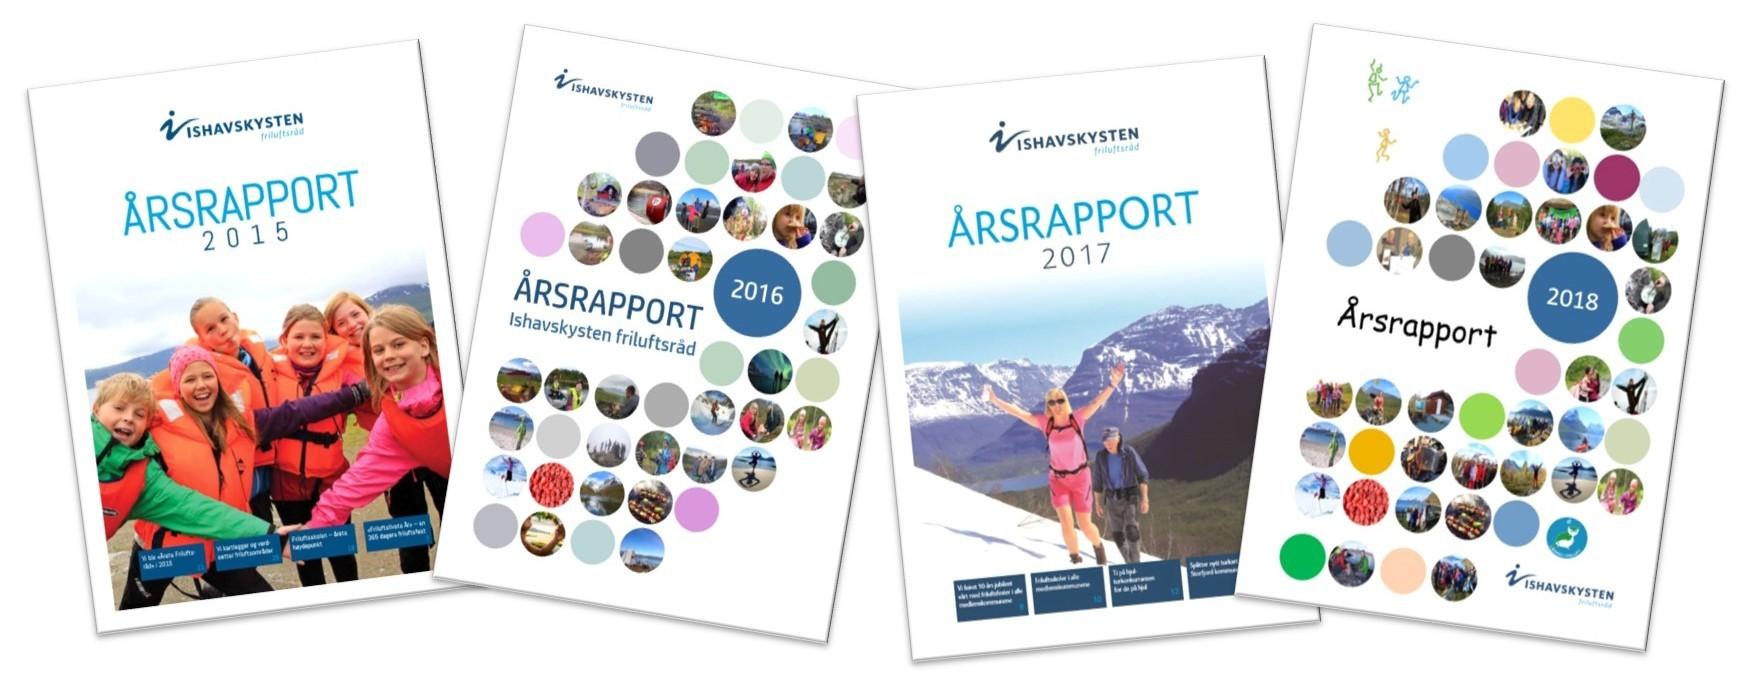 Årsrapporter2015-2018 forsider